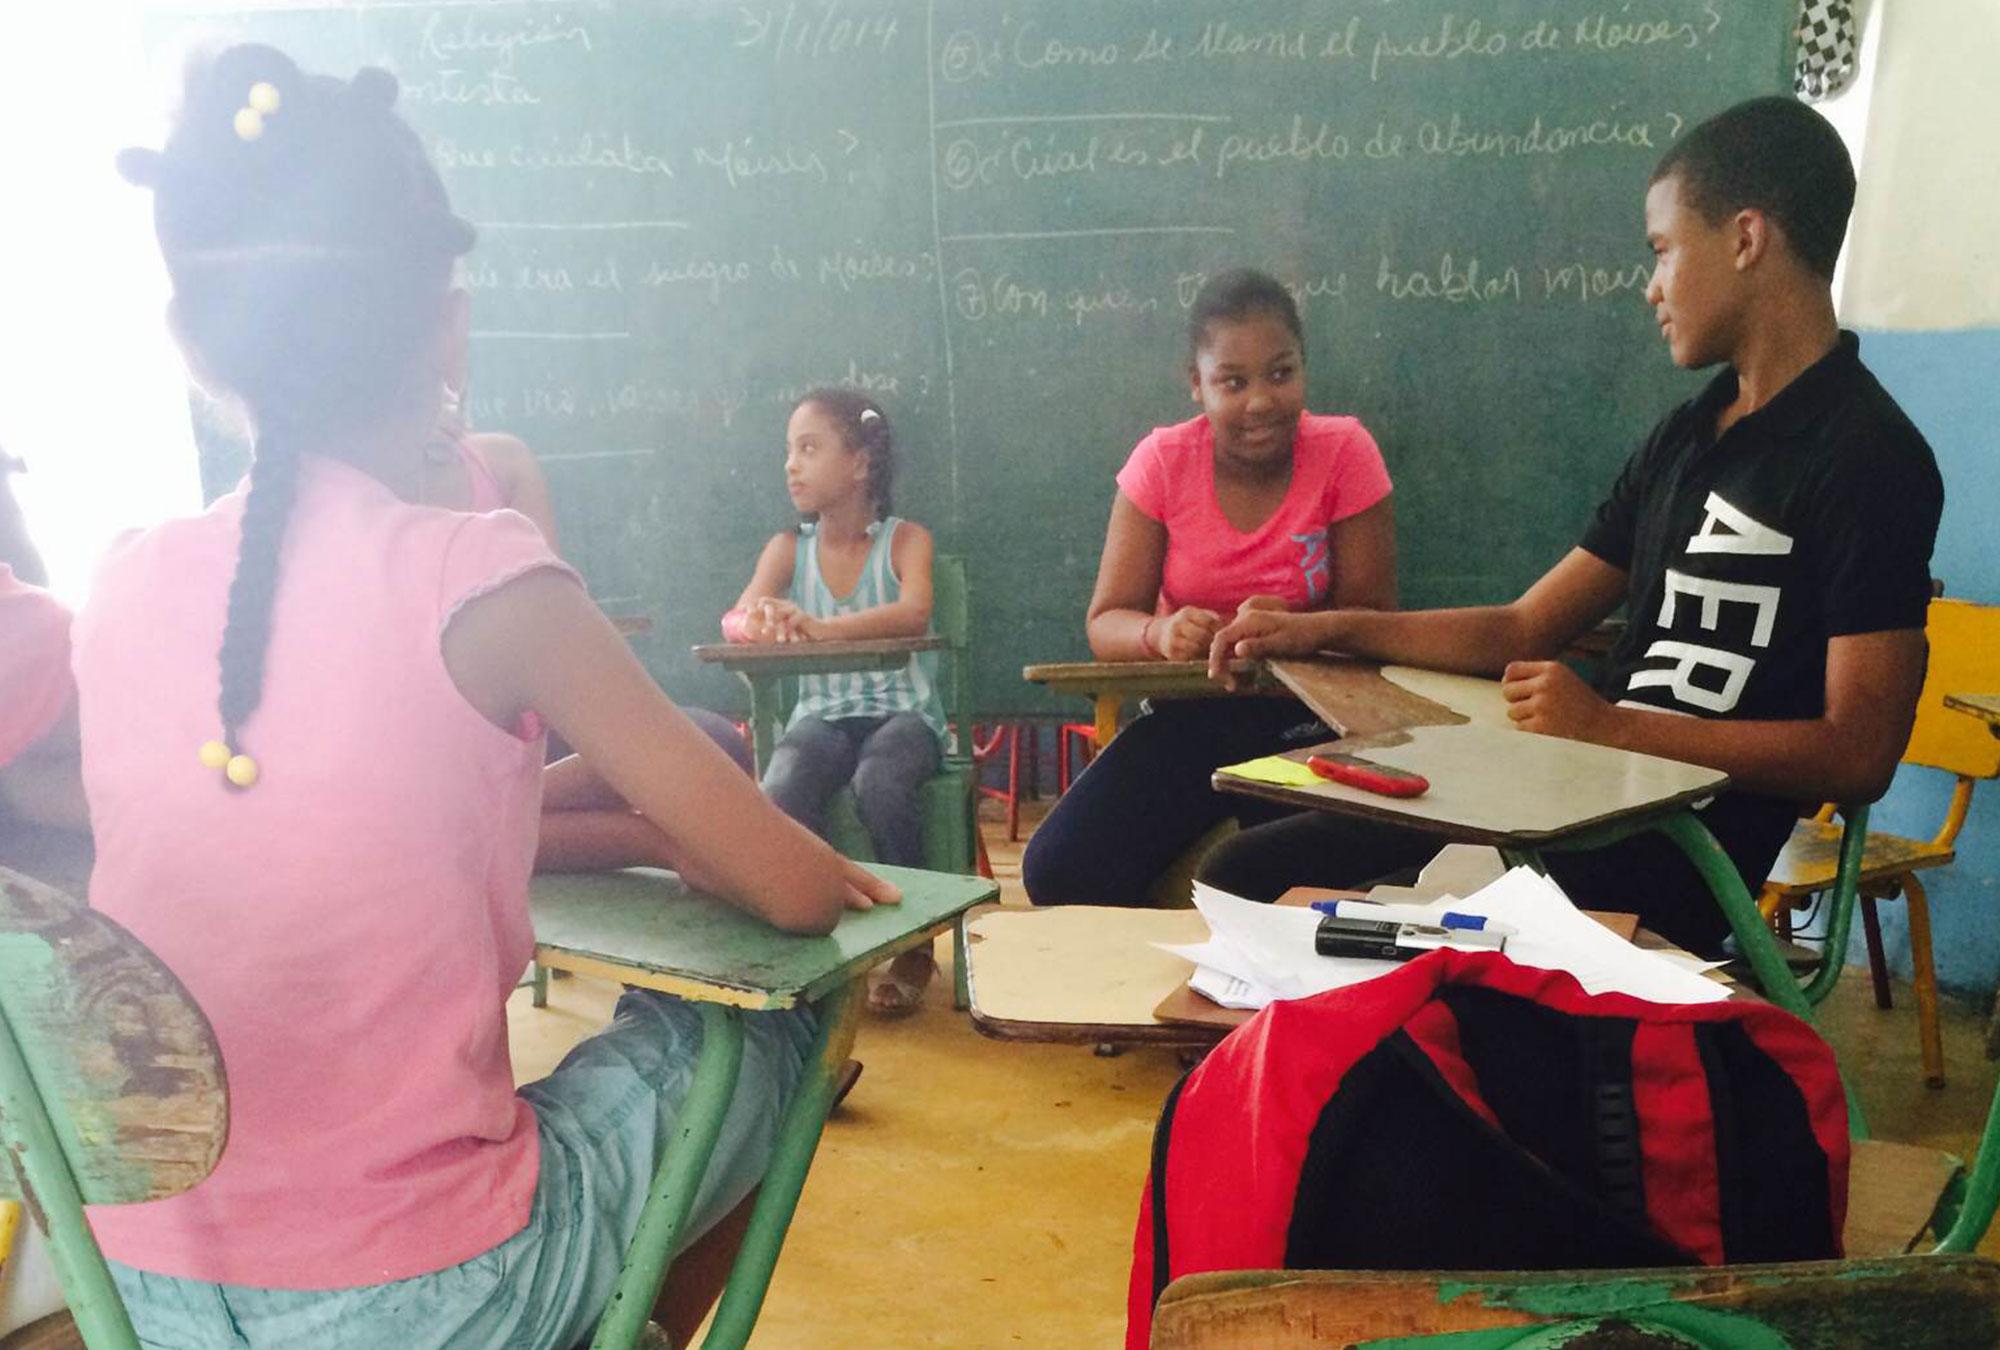 Children sit in schooldesks in front of blackboard